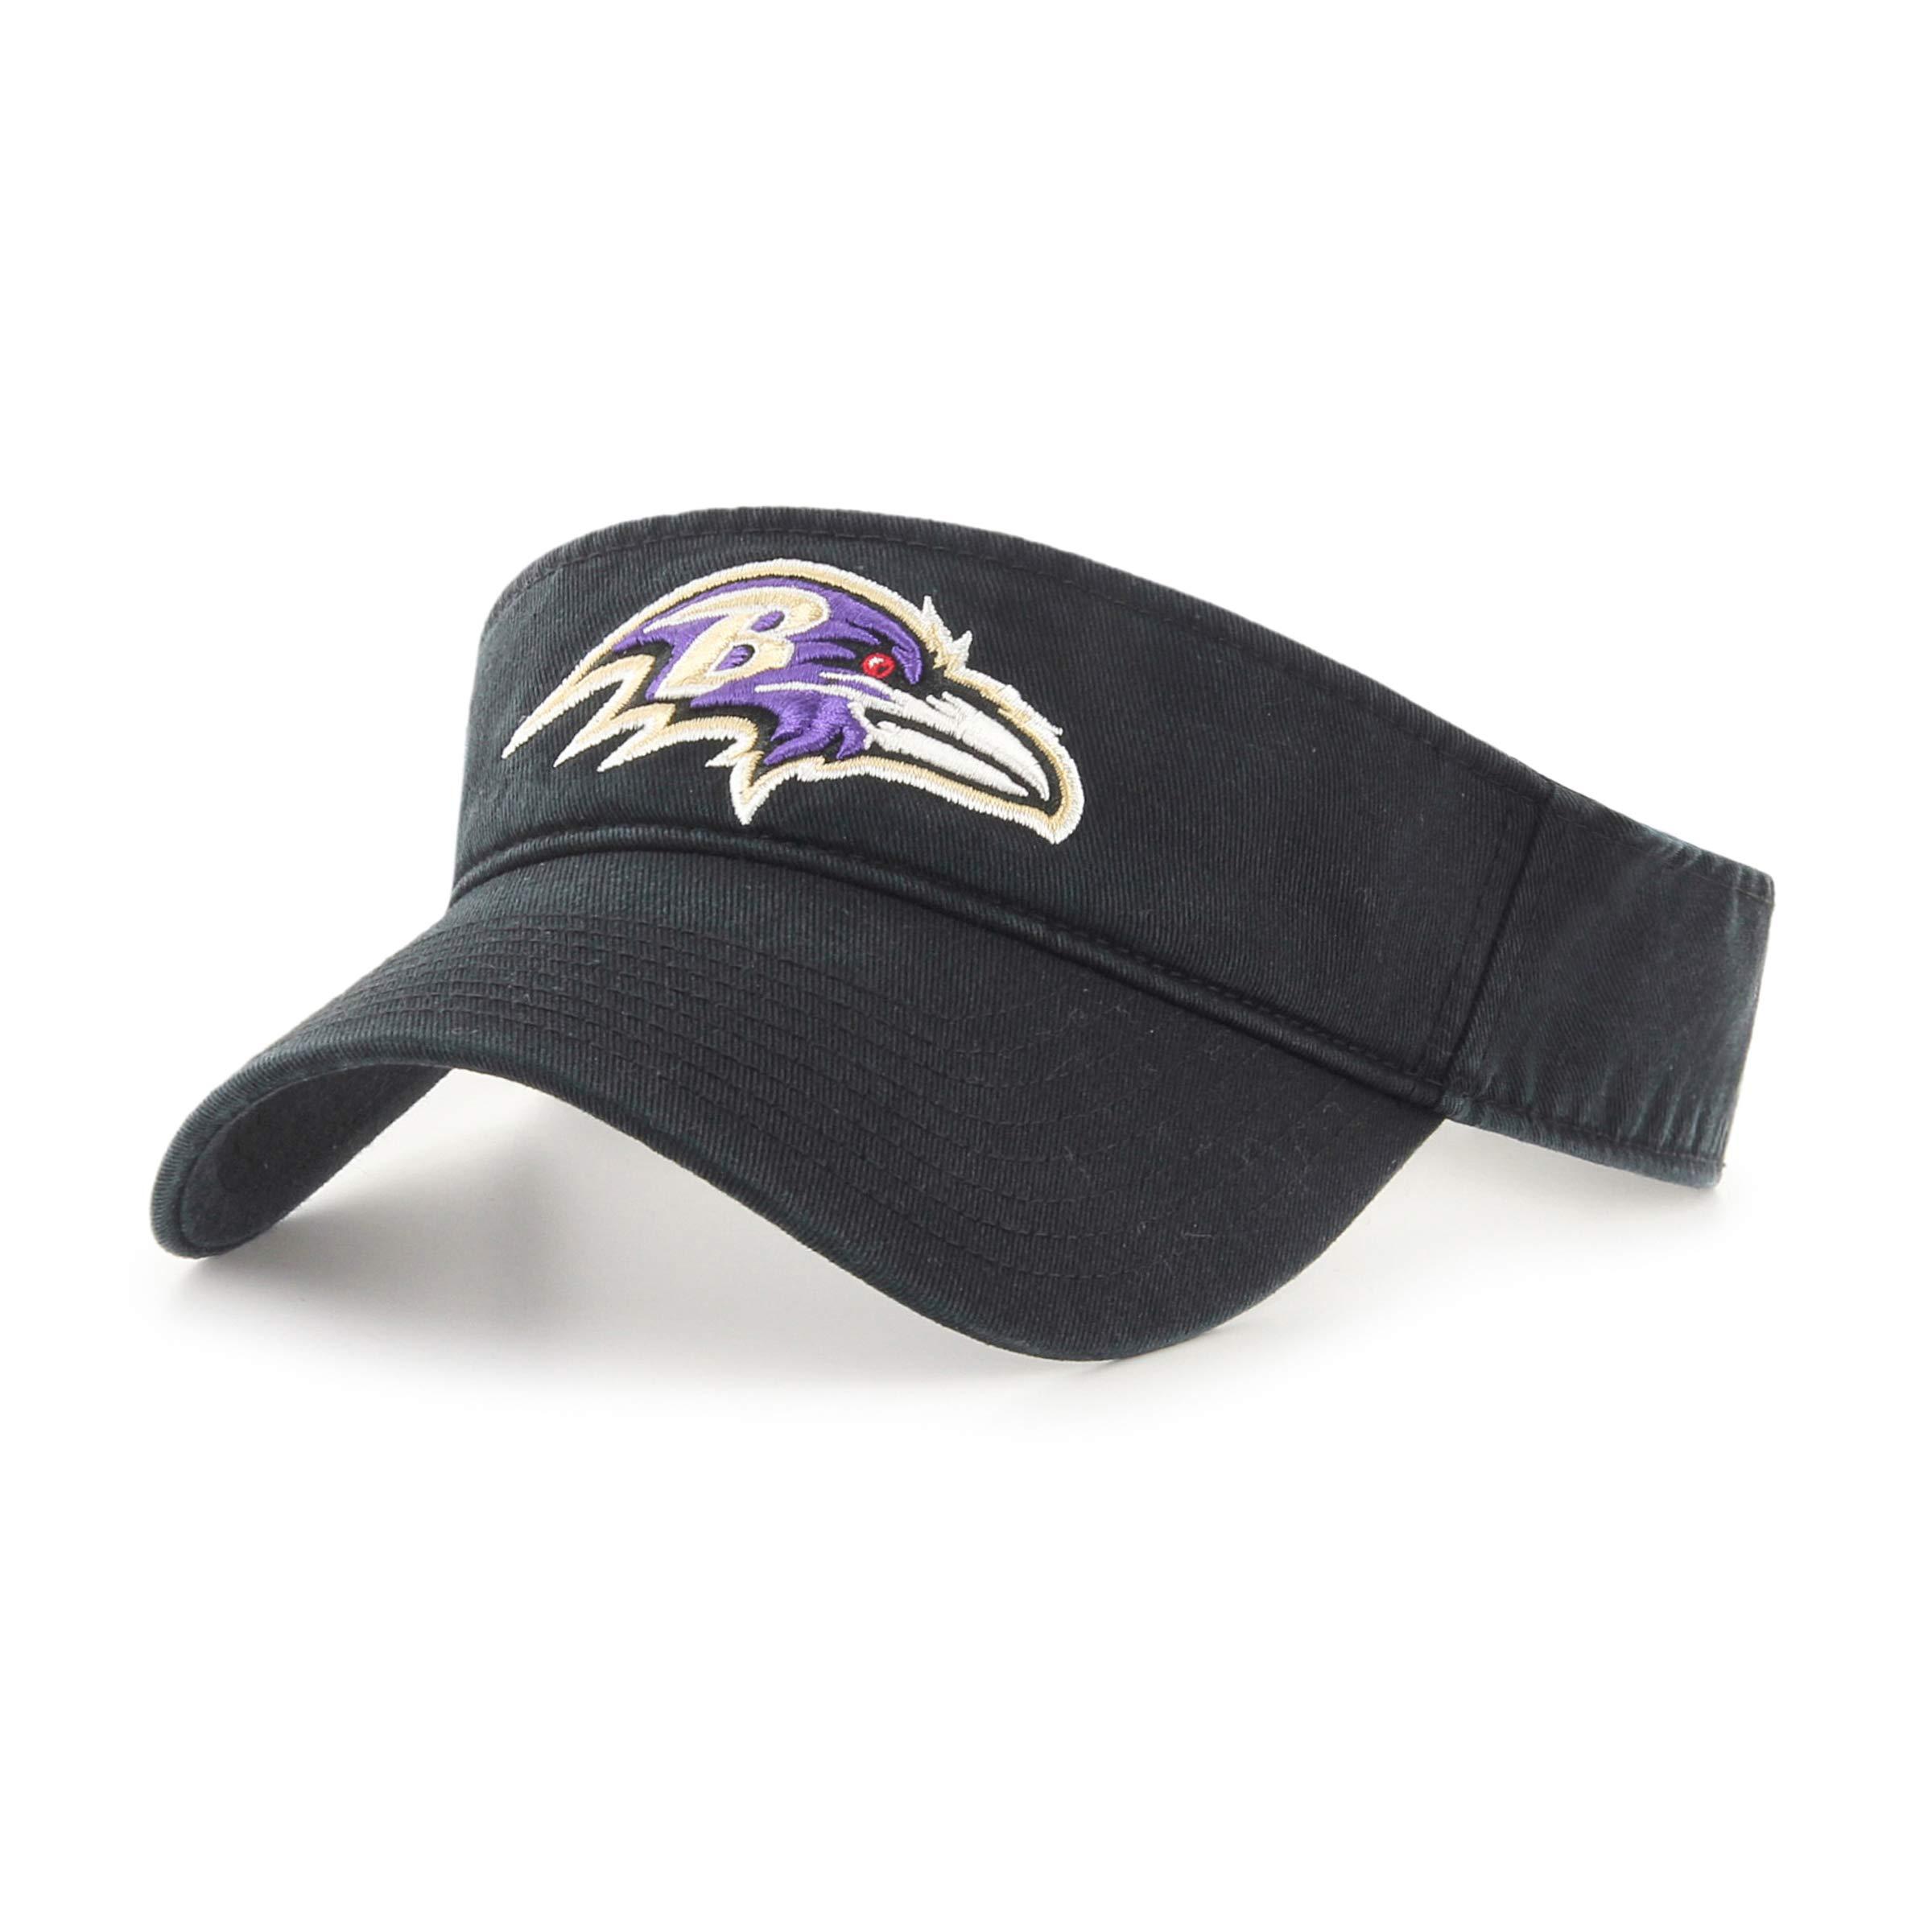 OTS NFL Baltimore Ravens Male Visor, Black, One Size